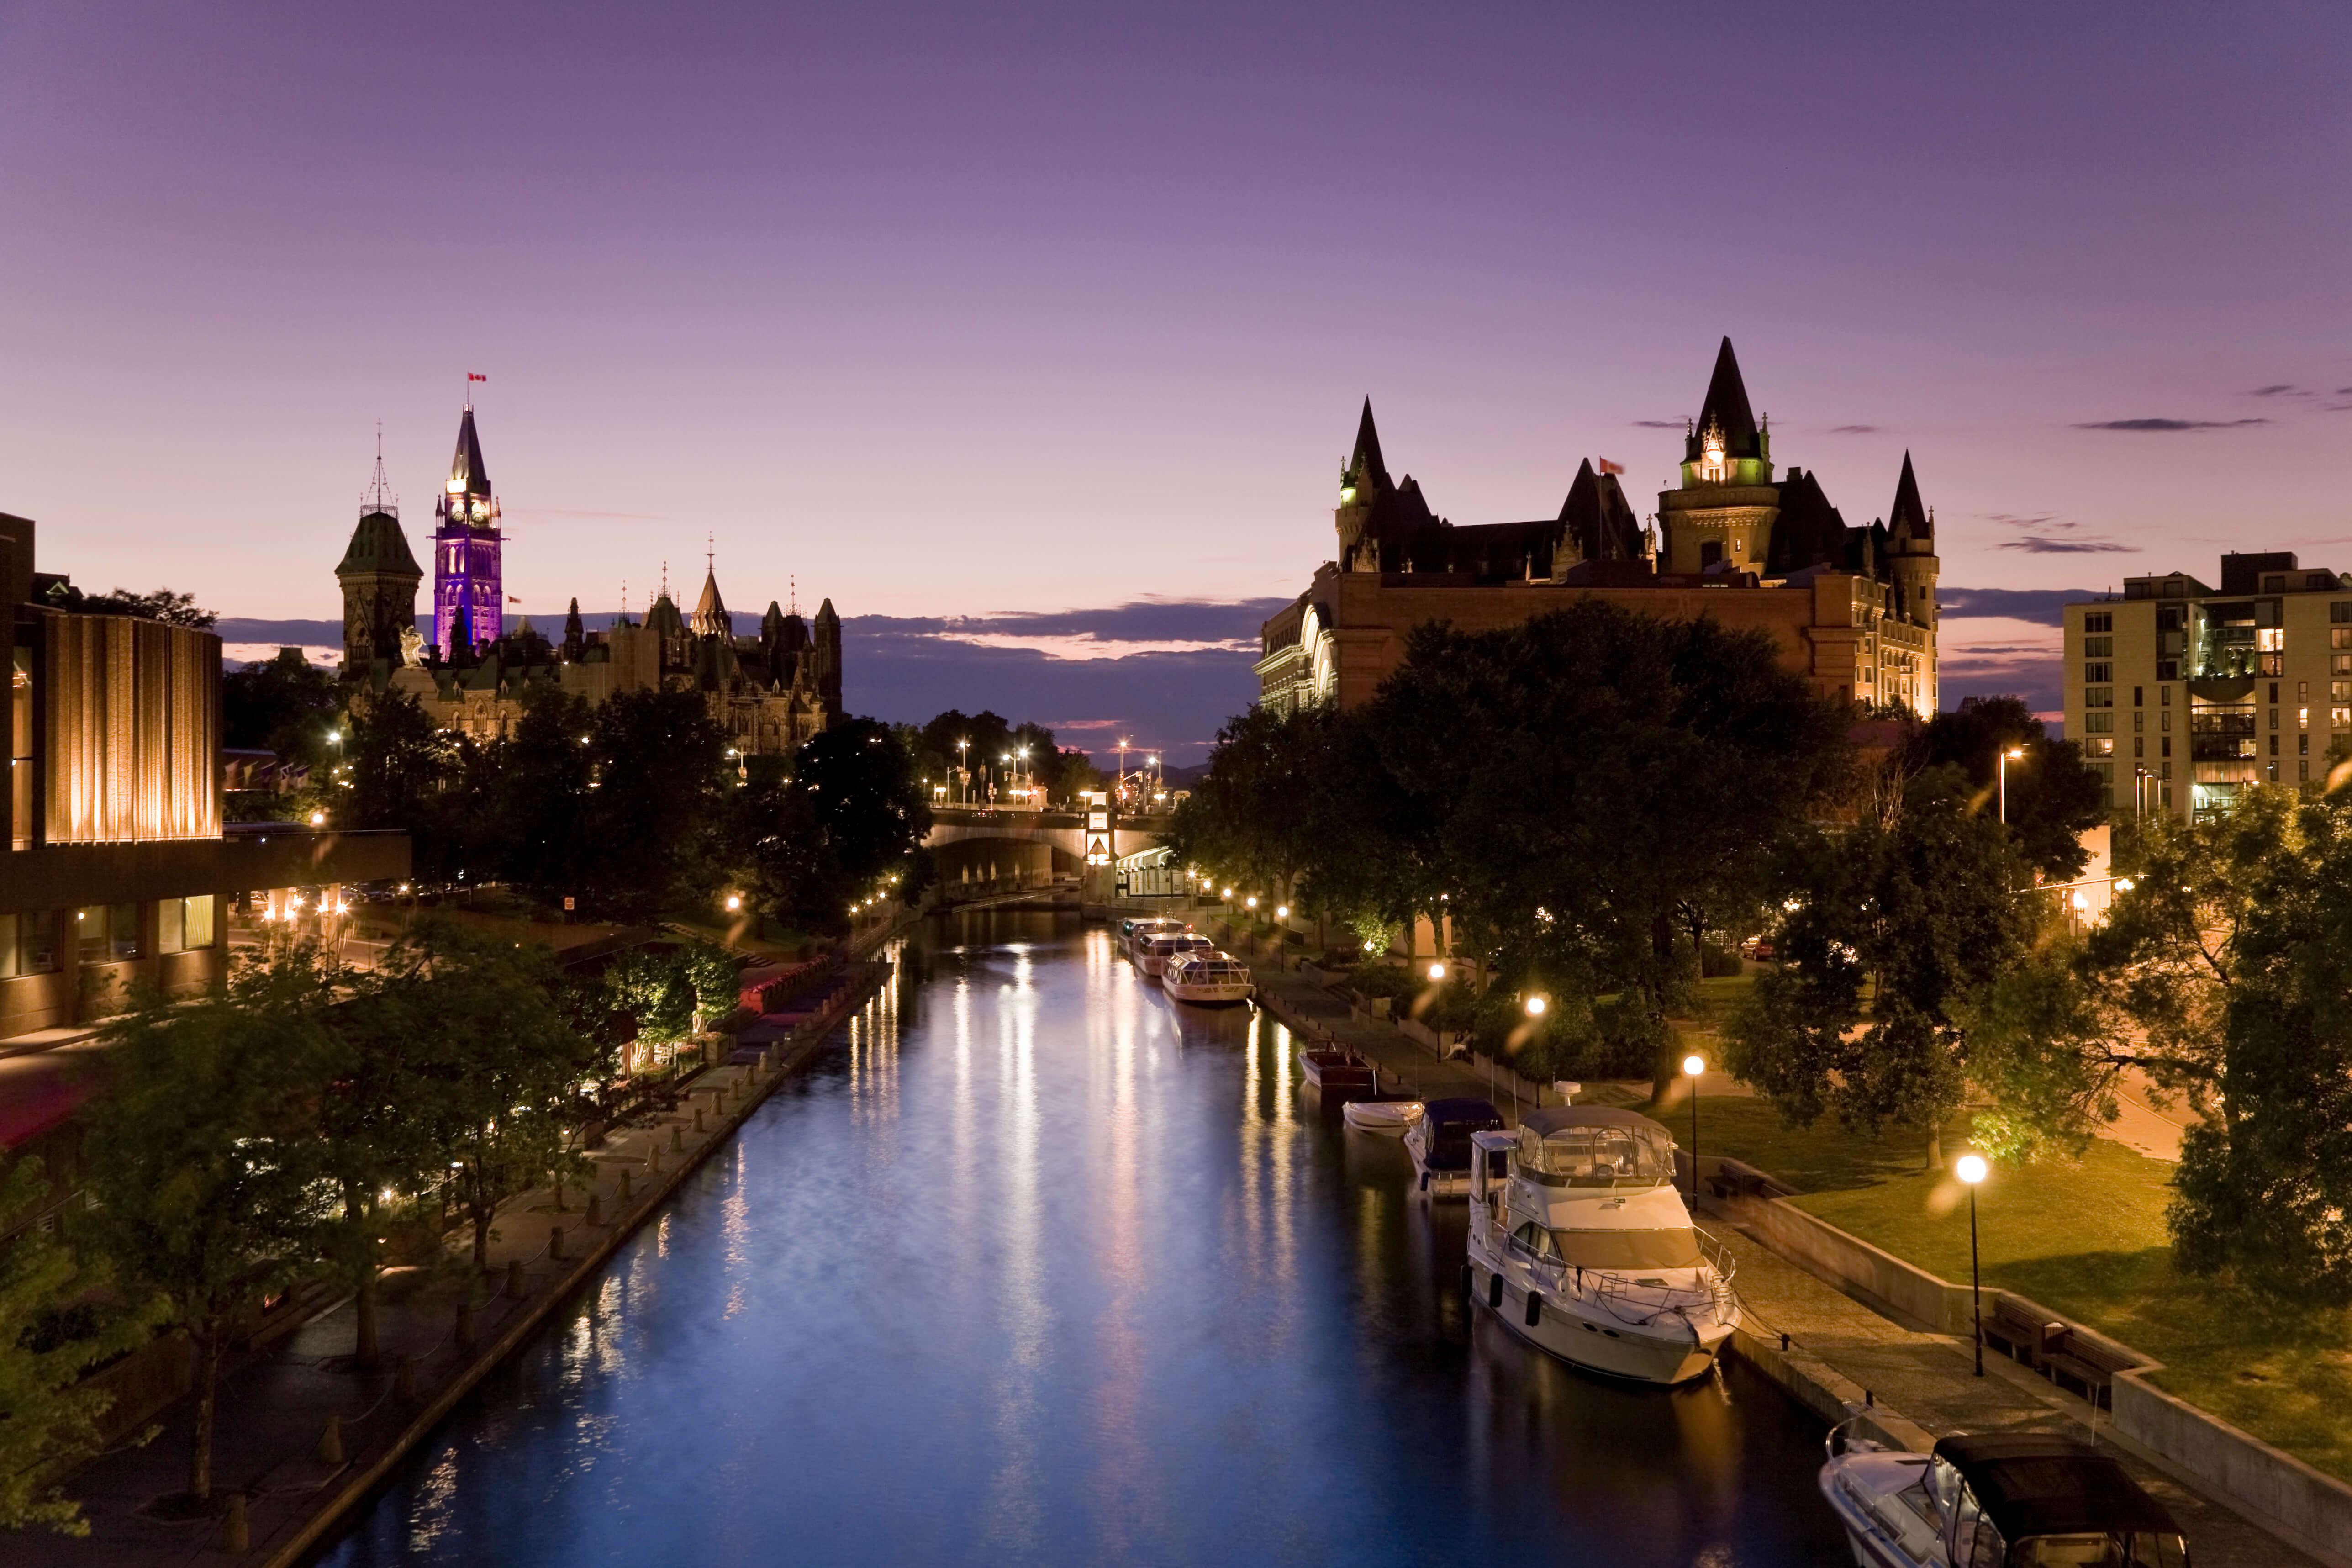 Best Place To Buy Diclofenac Online Canada